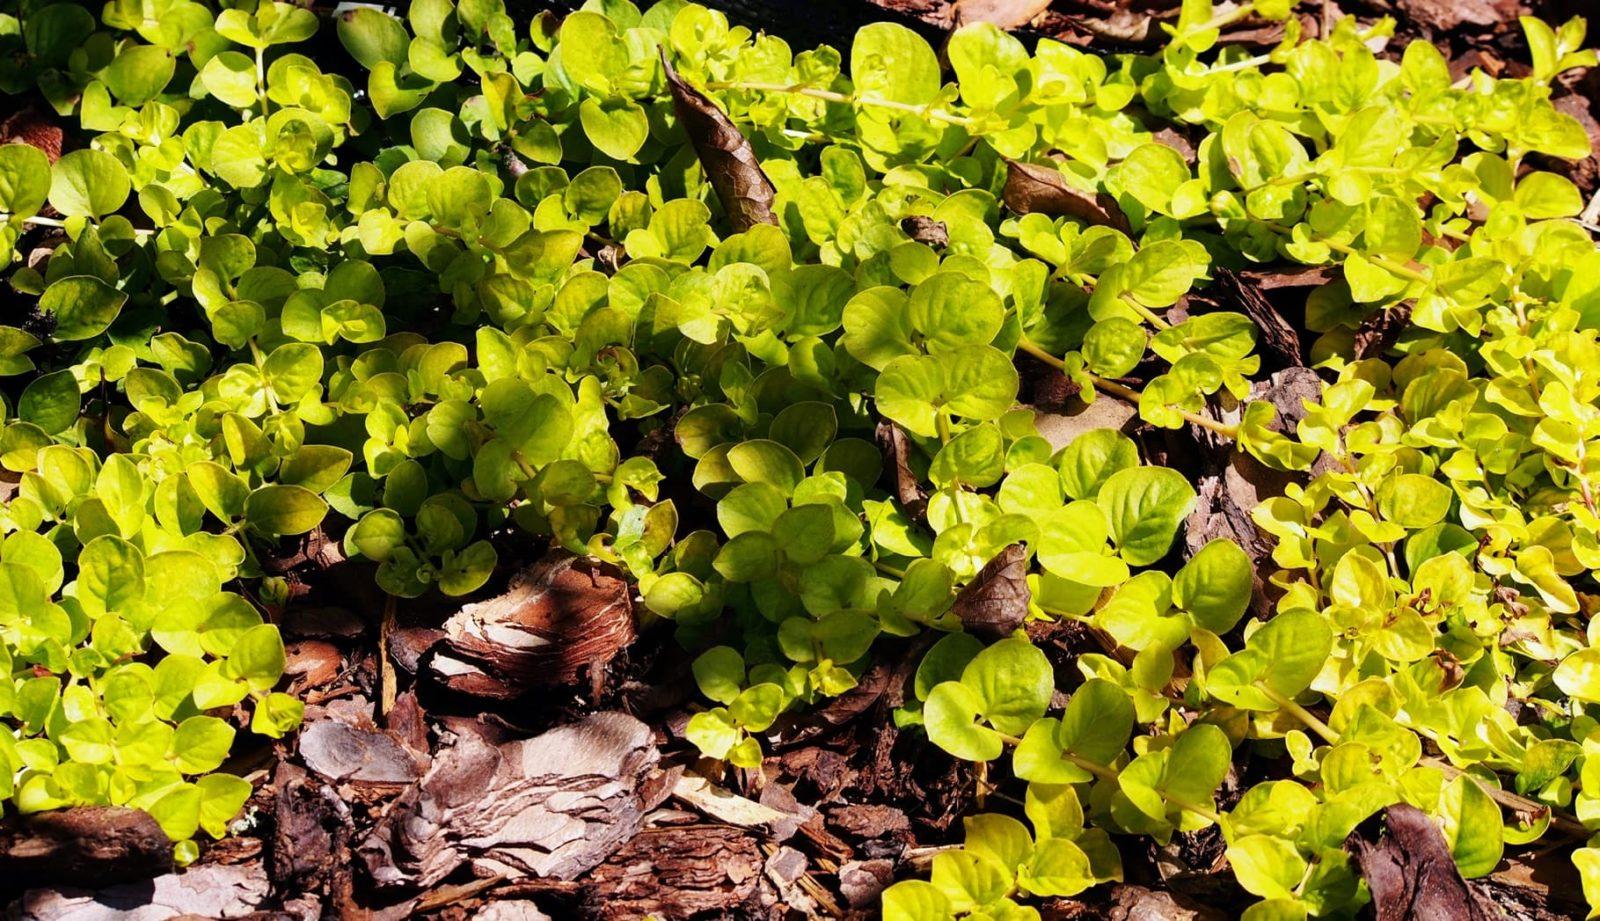 Lysimachia nummularia 'Aurea' plant with bark in a garden